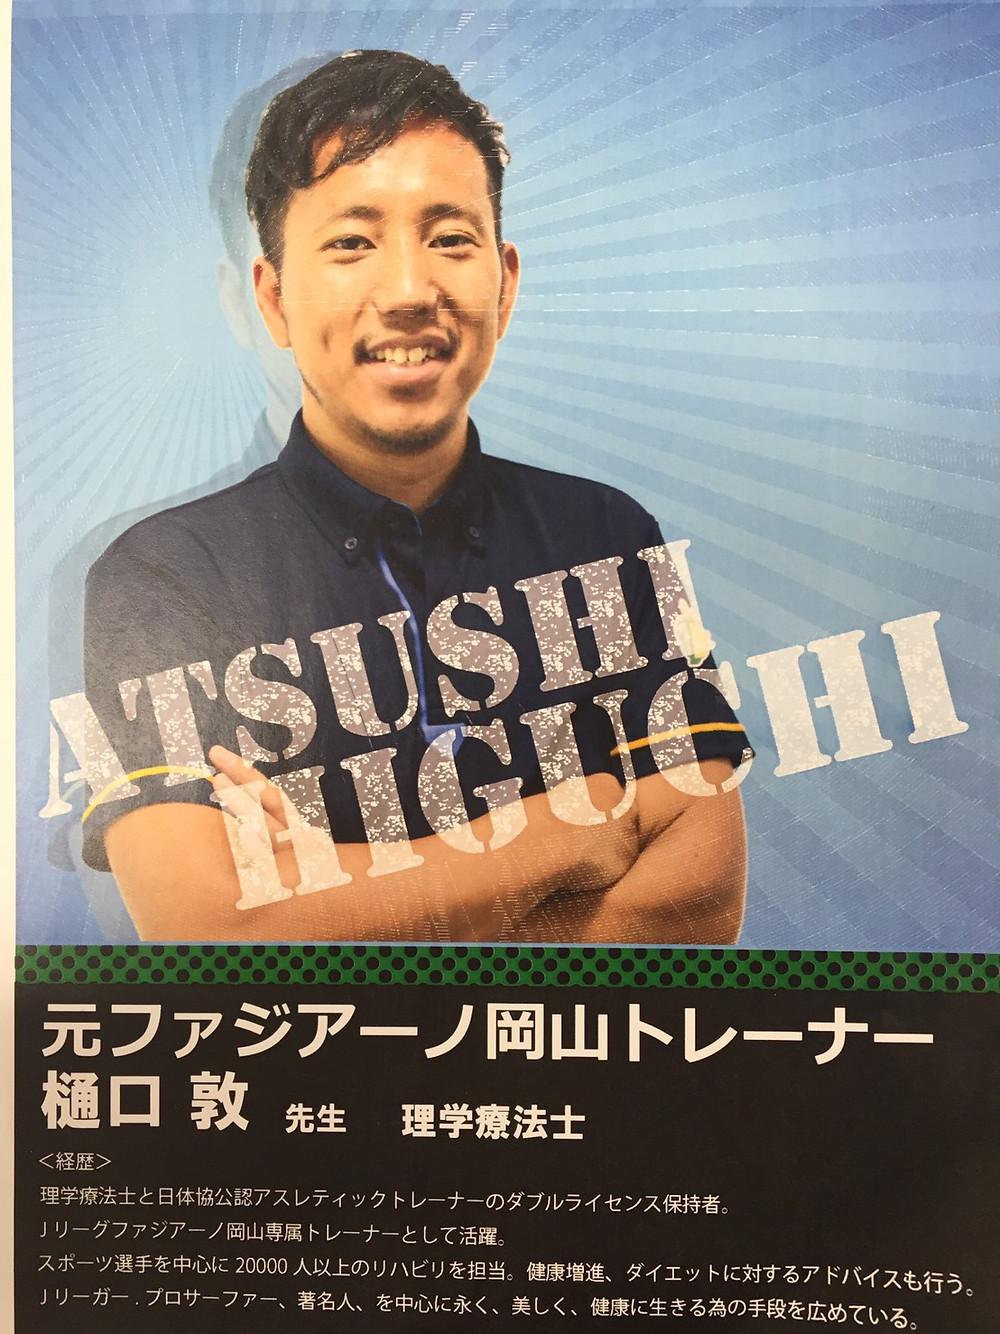 →axis mishuku (アクシス ミシュク) 【三軒茶屋・池尻大橋・三宿エリアのパーソナルトレーニングジム】